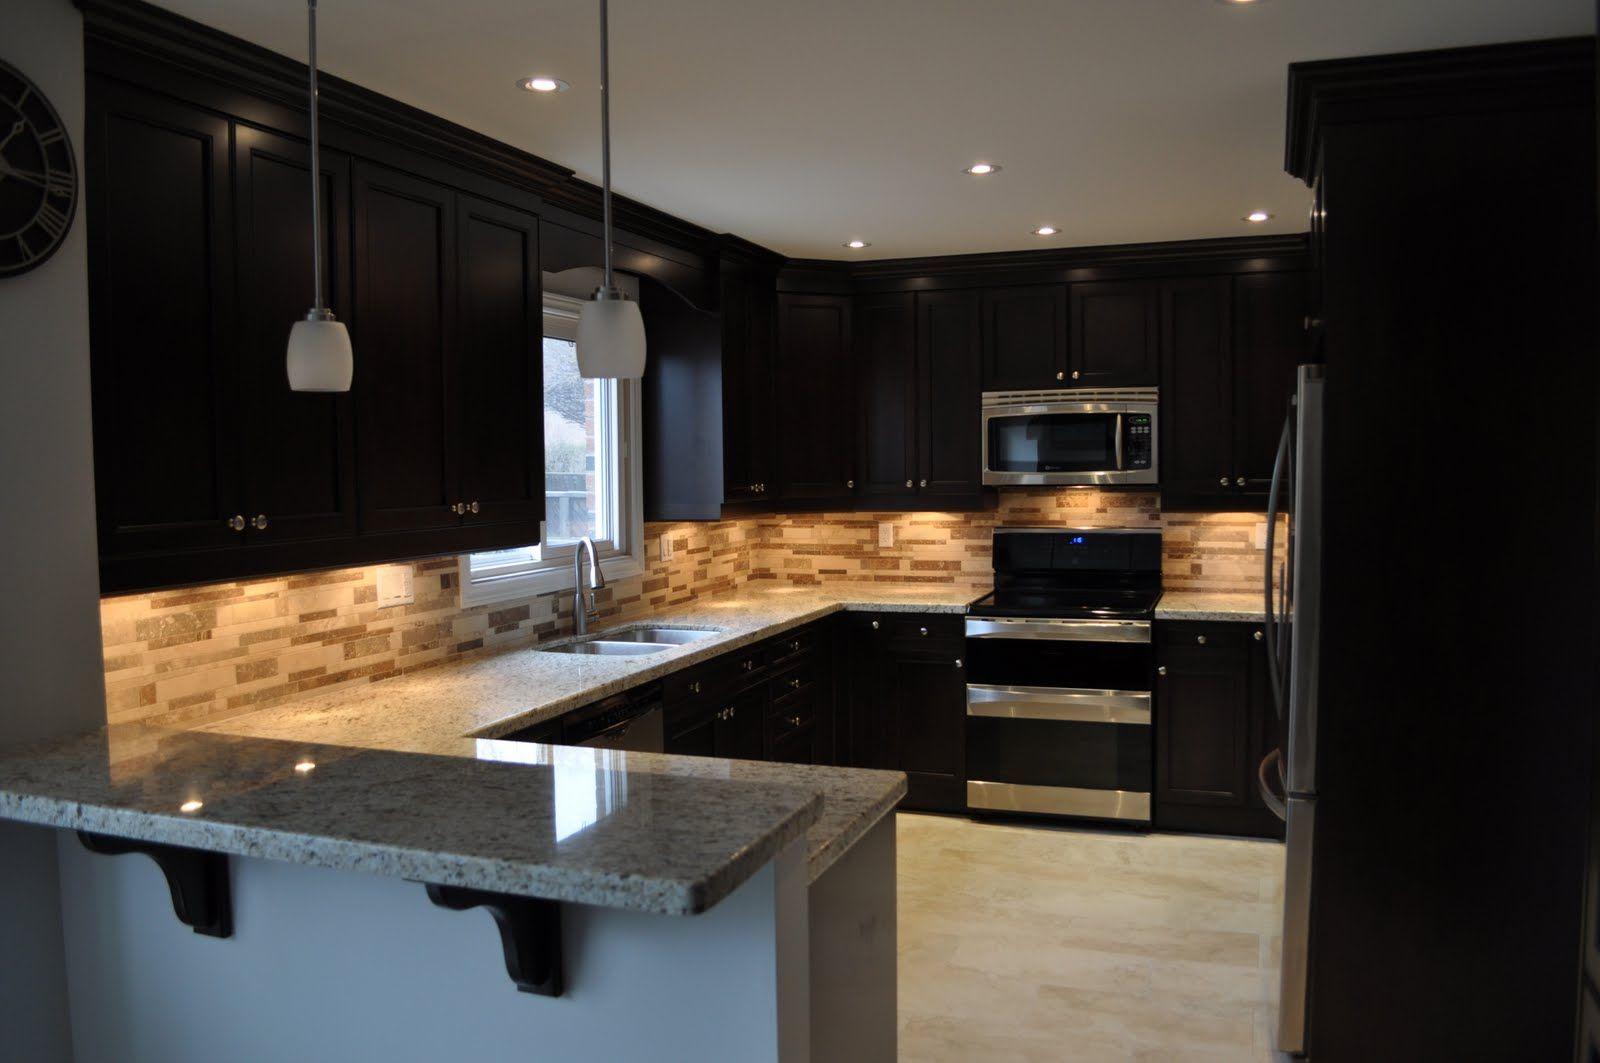 Uncategorized Black Kitchen Designs kitchen endearing u shape design ideas using black wood cabinet along with under